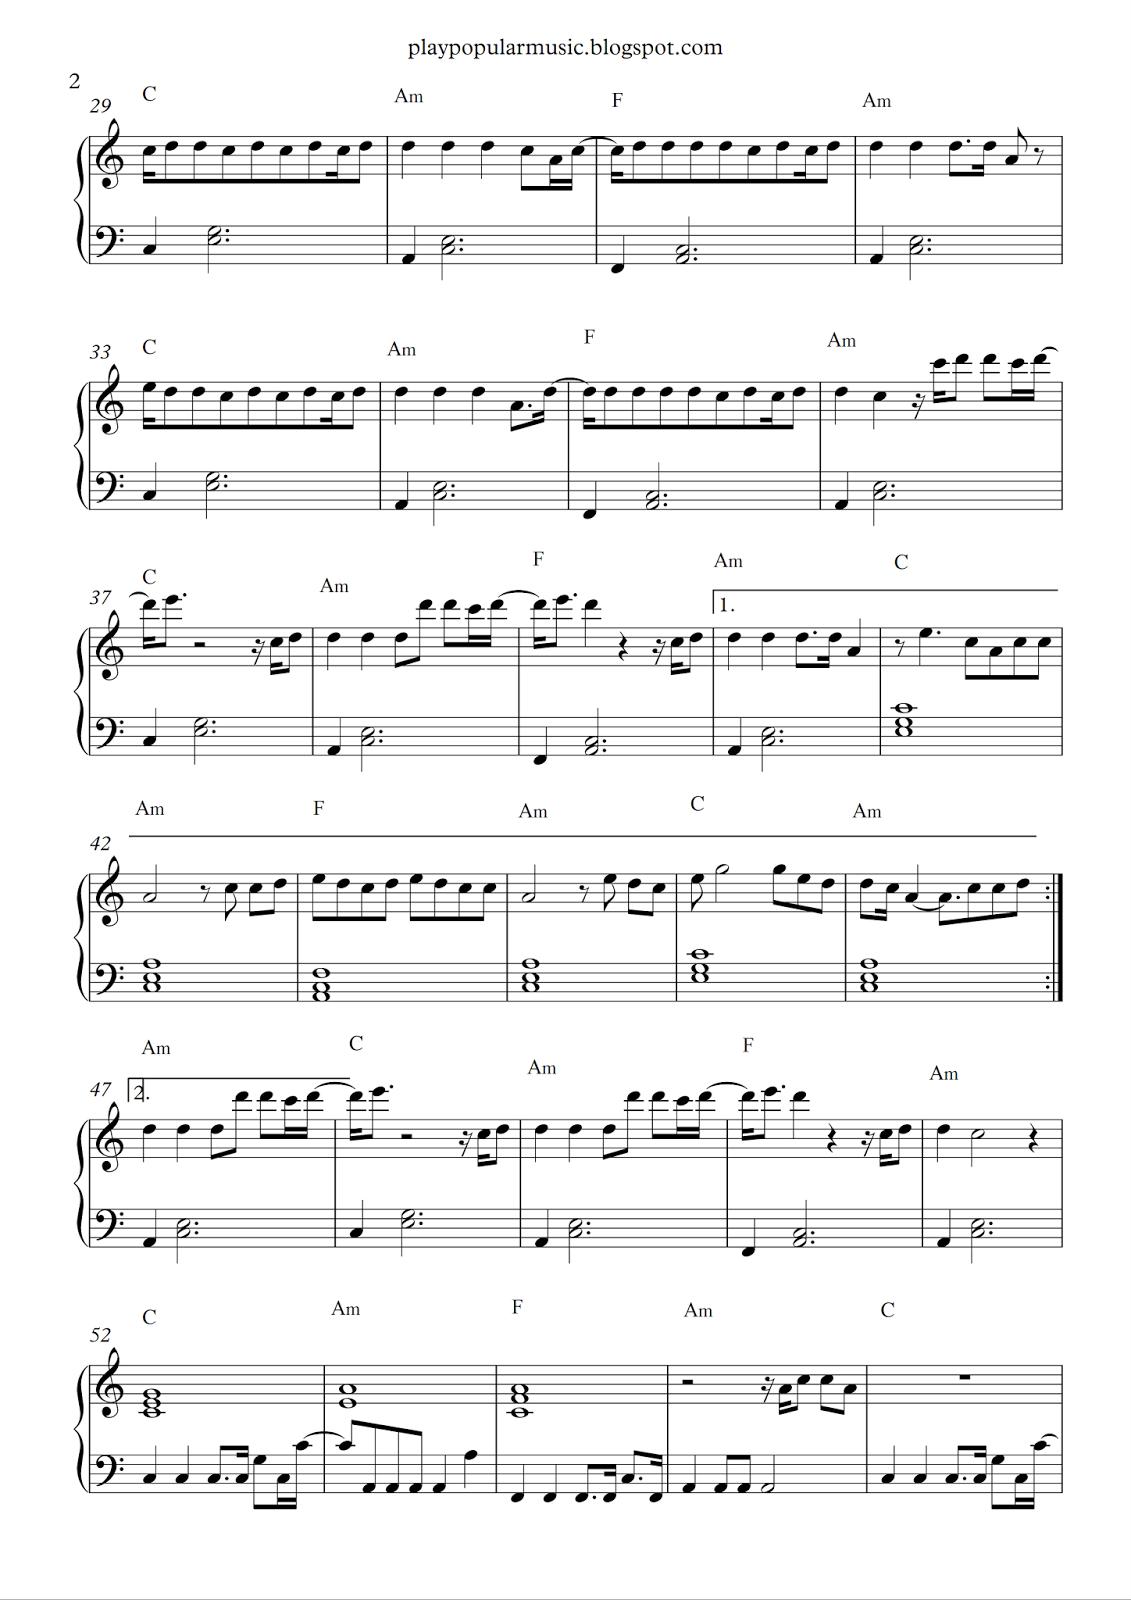 Free Piano Sheet Music: Can't Stop The Feeling! - Justin Timberlake - Free Printable Music Sheets Pdf